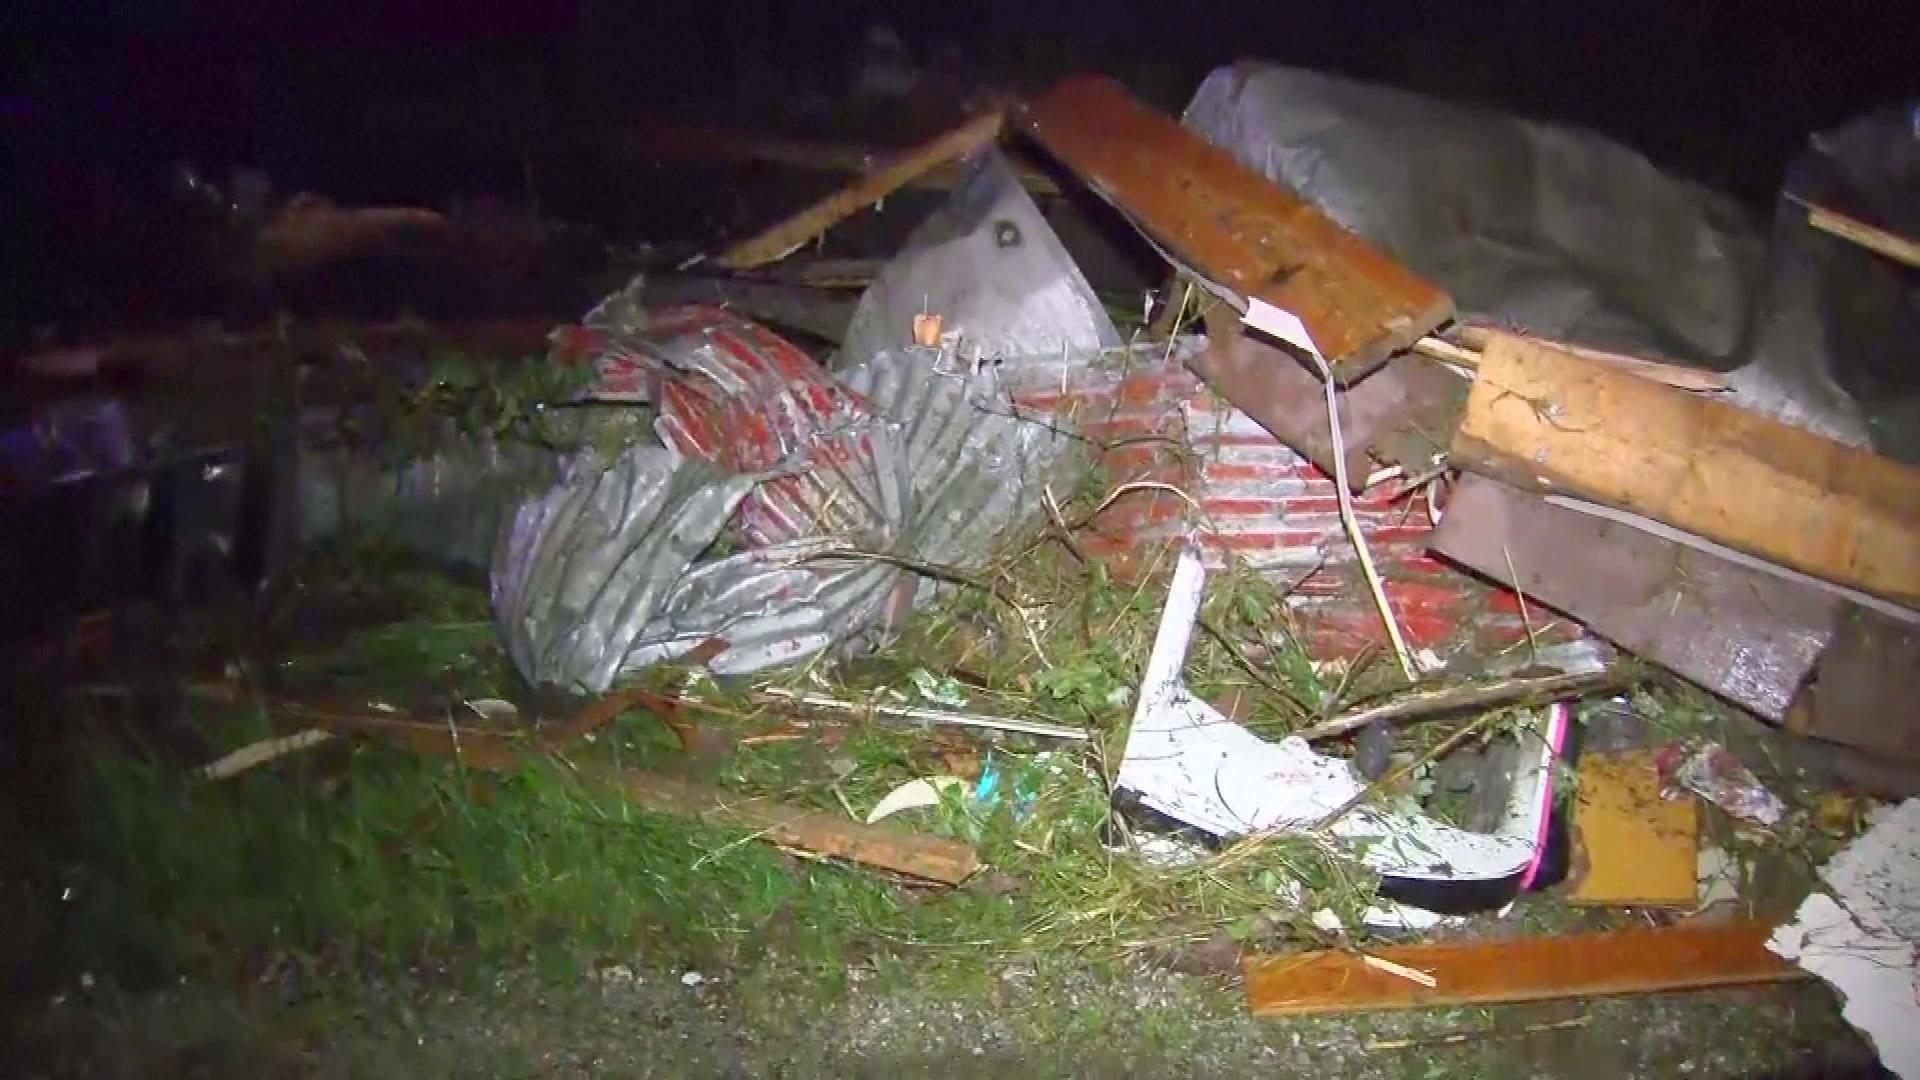 Suspected tornado kills three in Missouri